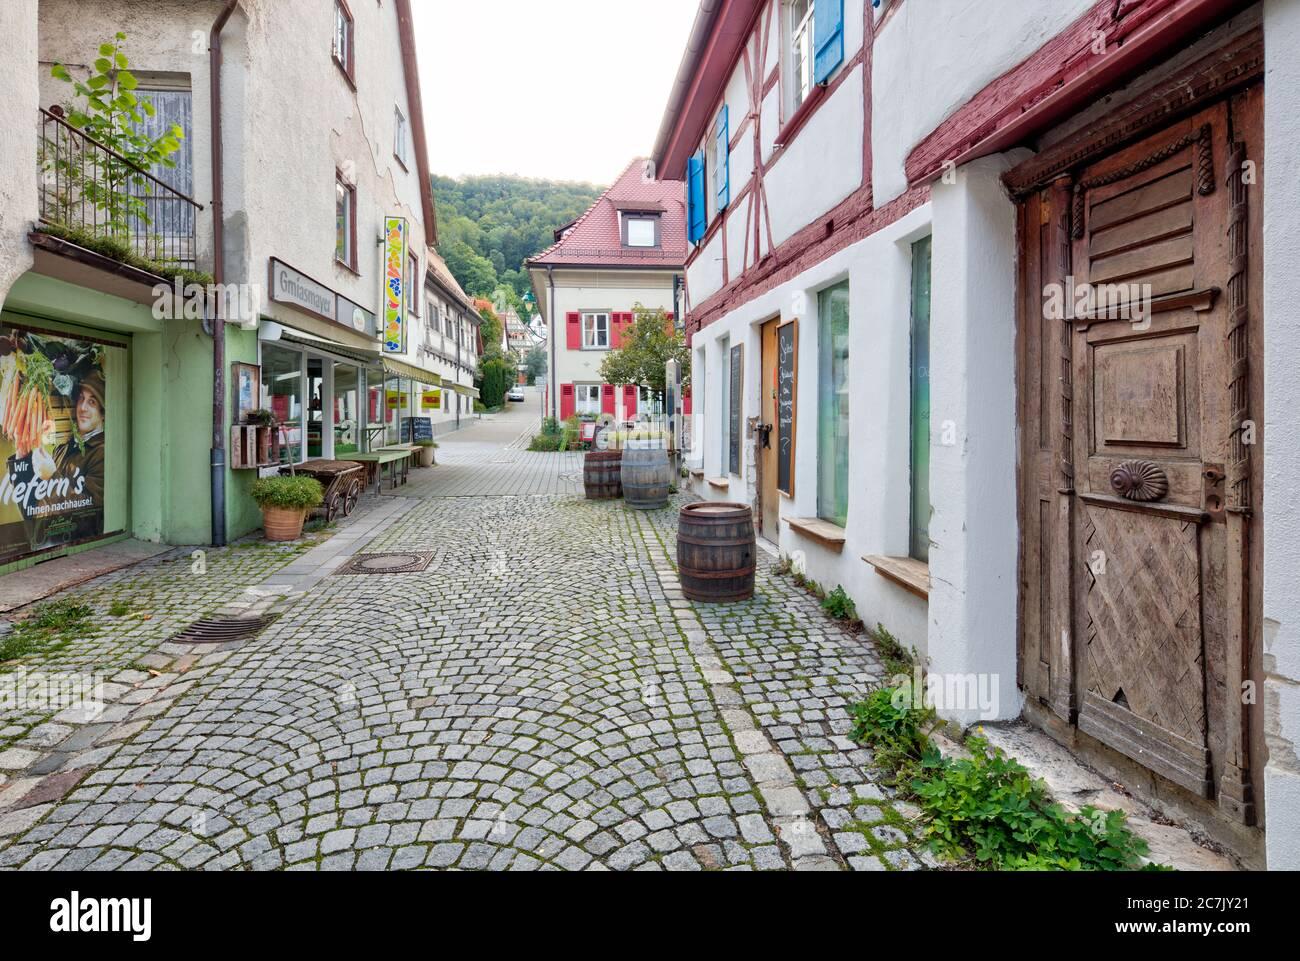 Picturesque alley, house facades, Half-timbered house, idyll, Blaubeuren, Alb-Donau district, Swabian Alb, Baden-Württemberg, Germany Stock Photo